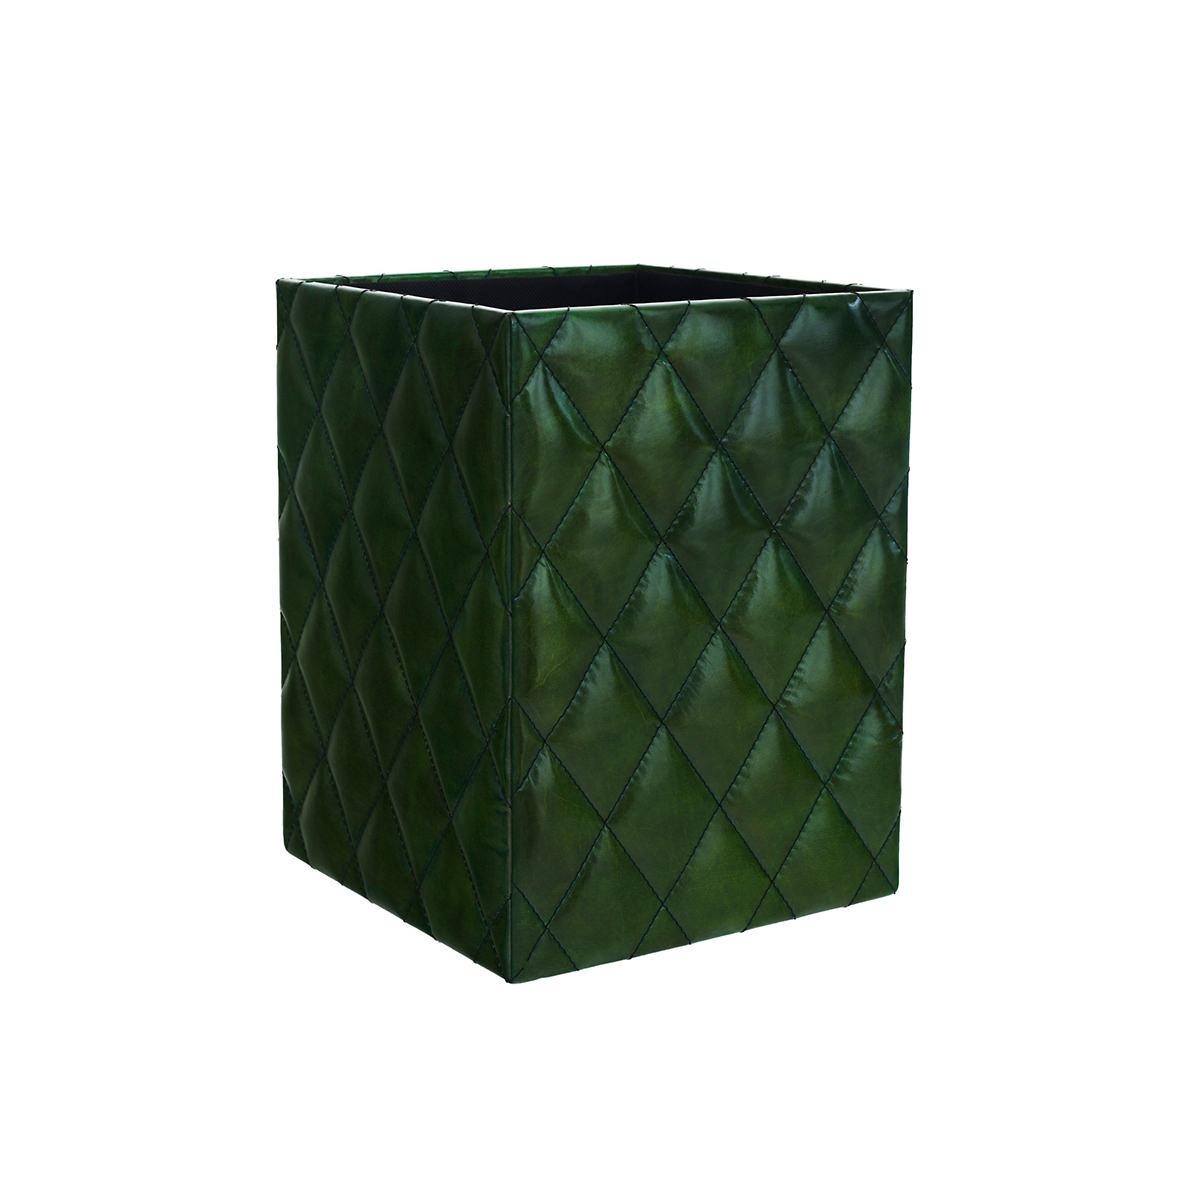 Watson Leather Evergreen Wastebasket